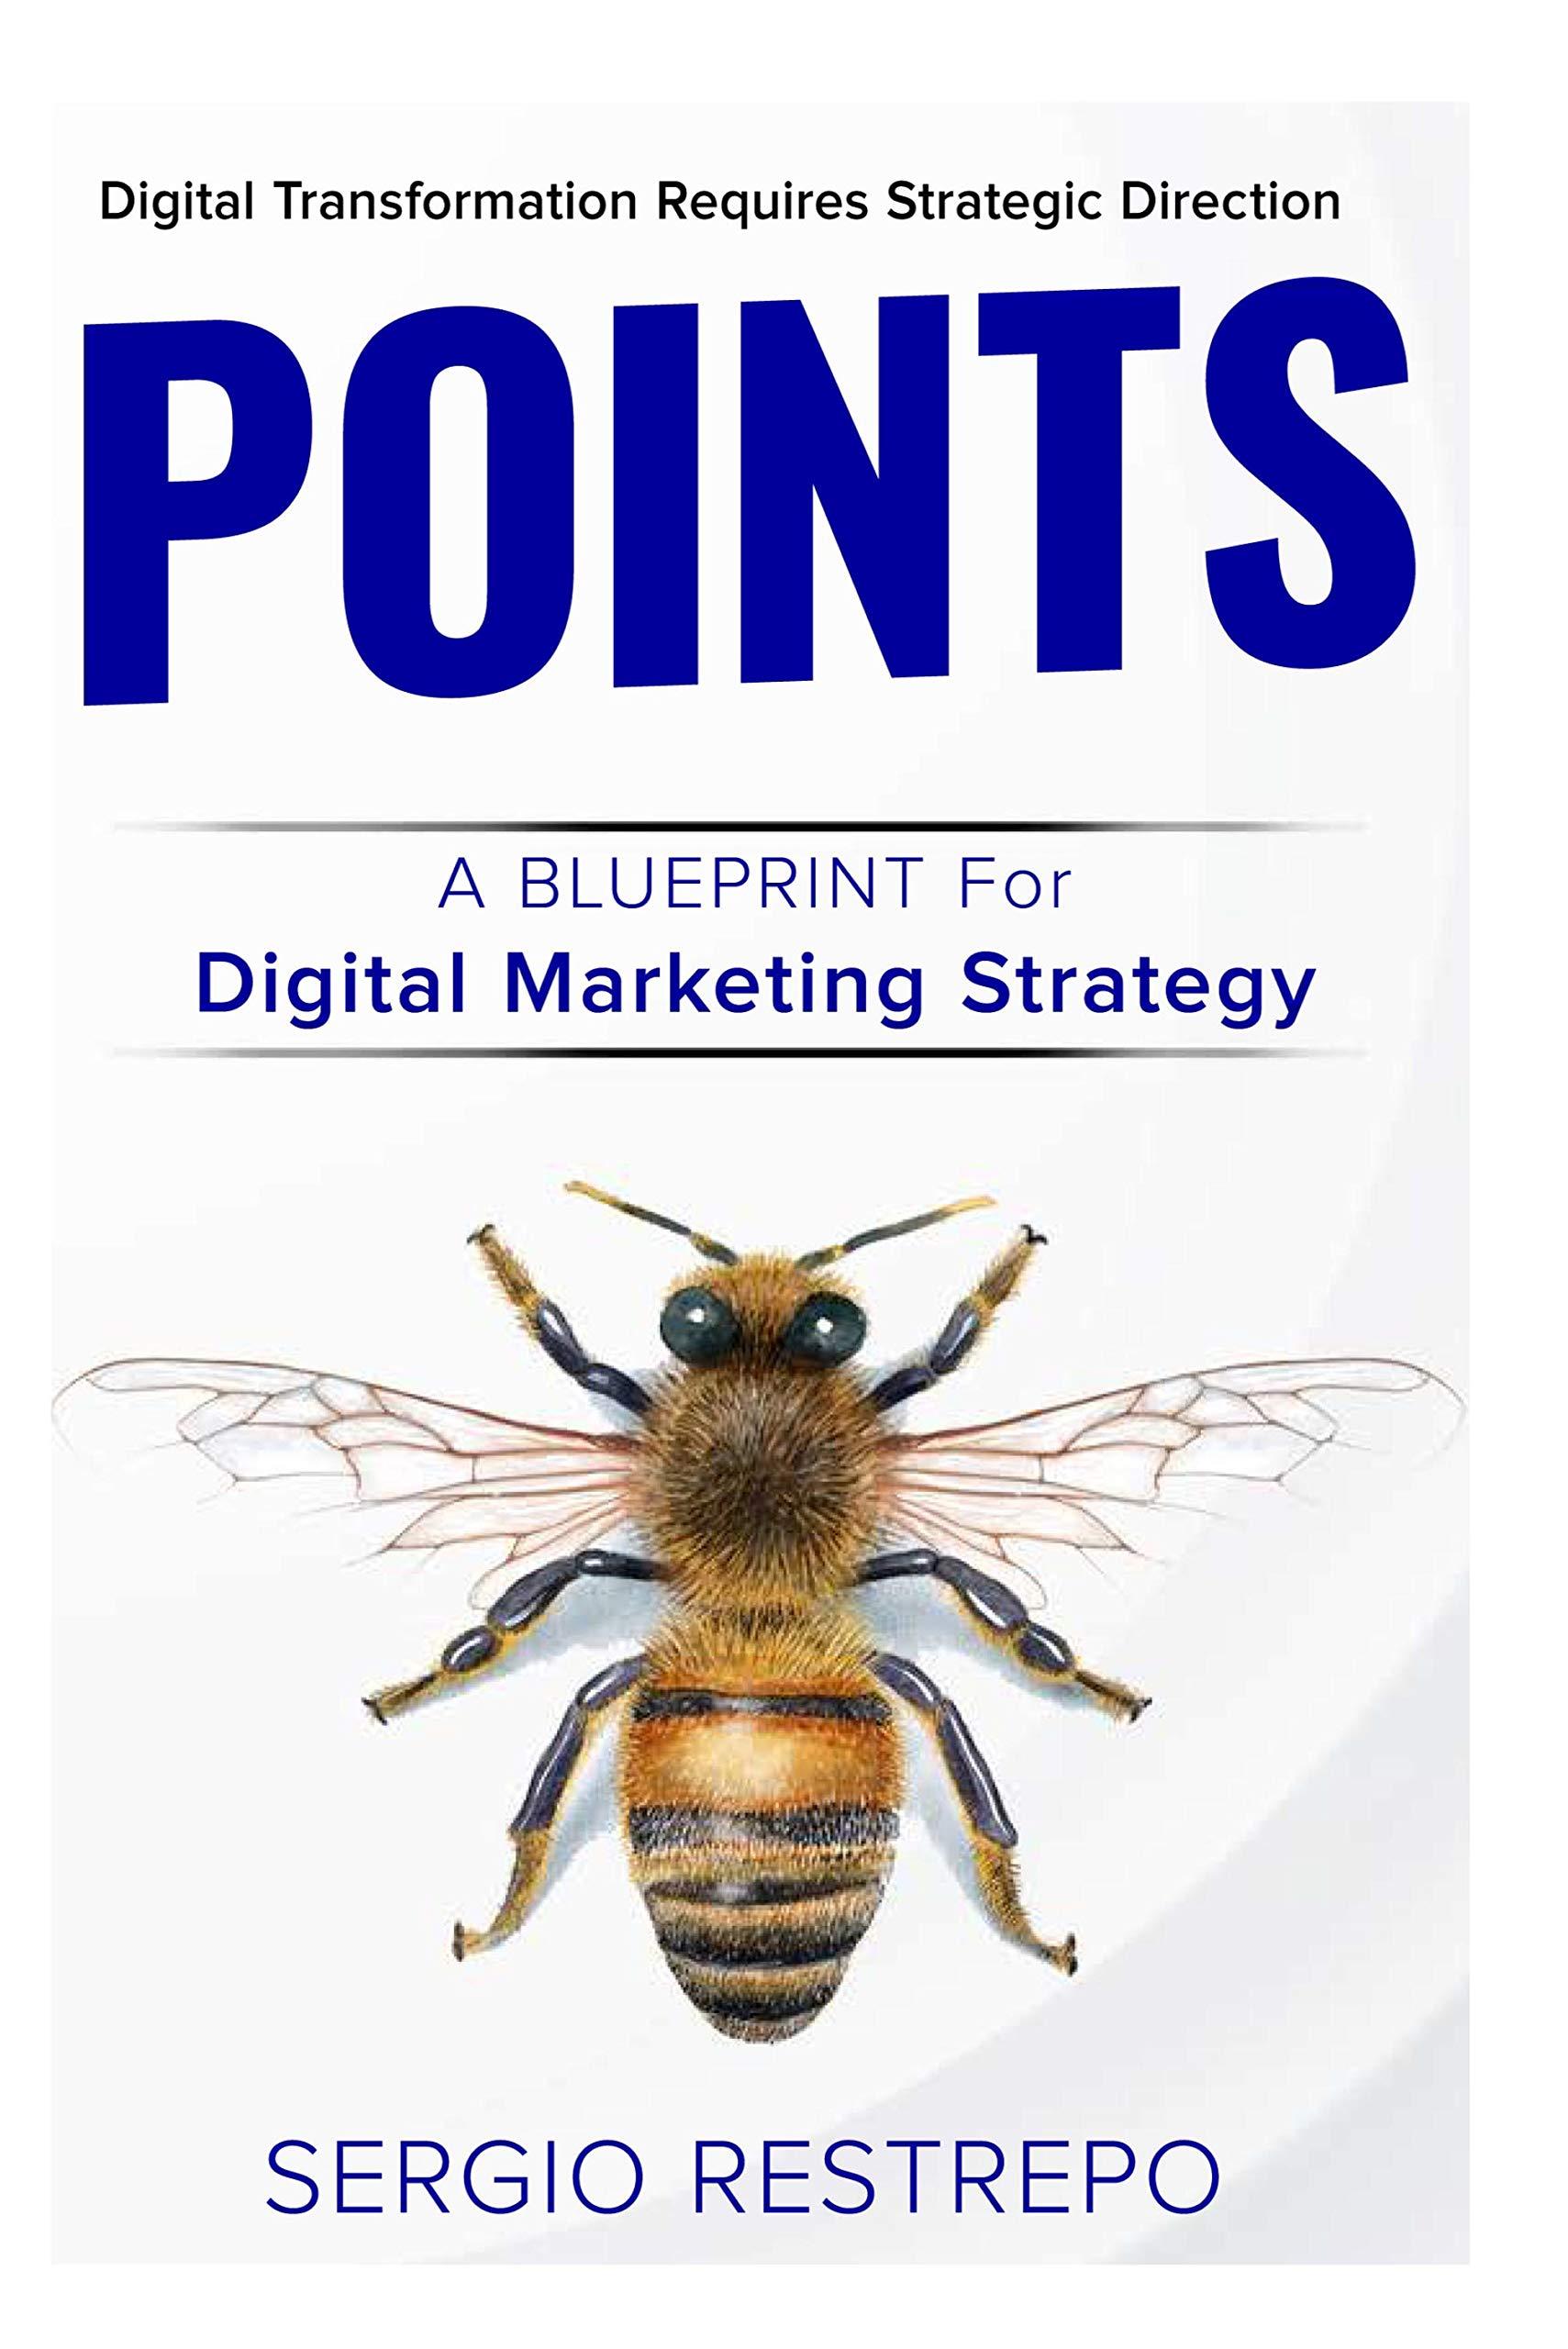 POINTS Methodology: A BLUEPRINT For Digital Marketing Strategy